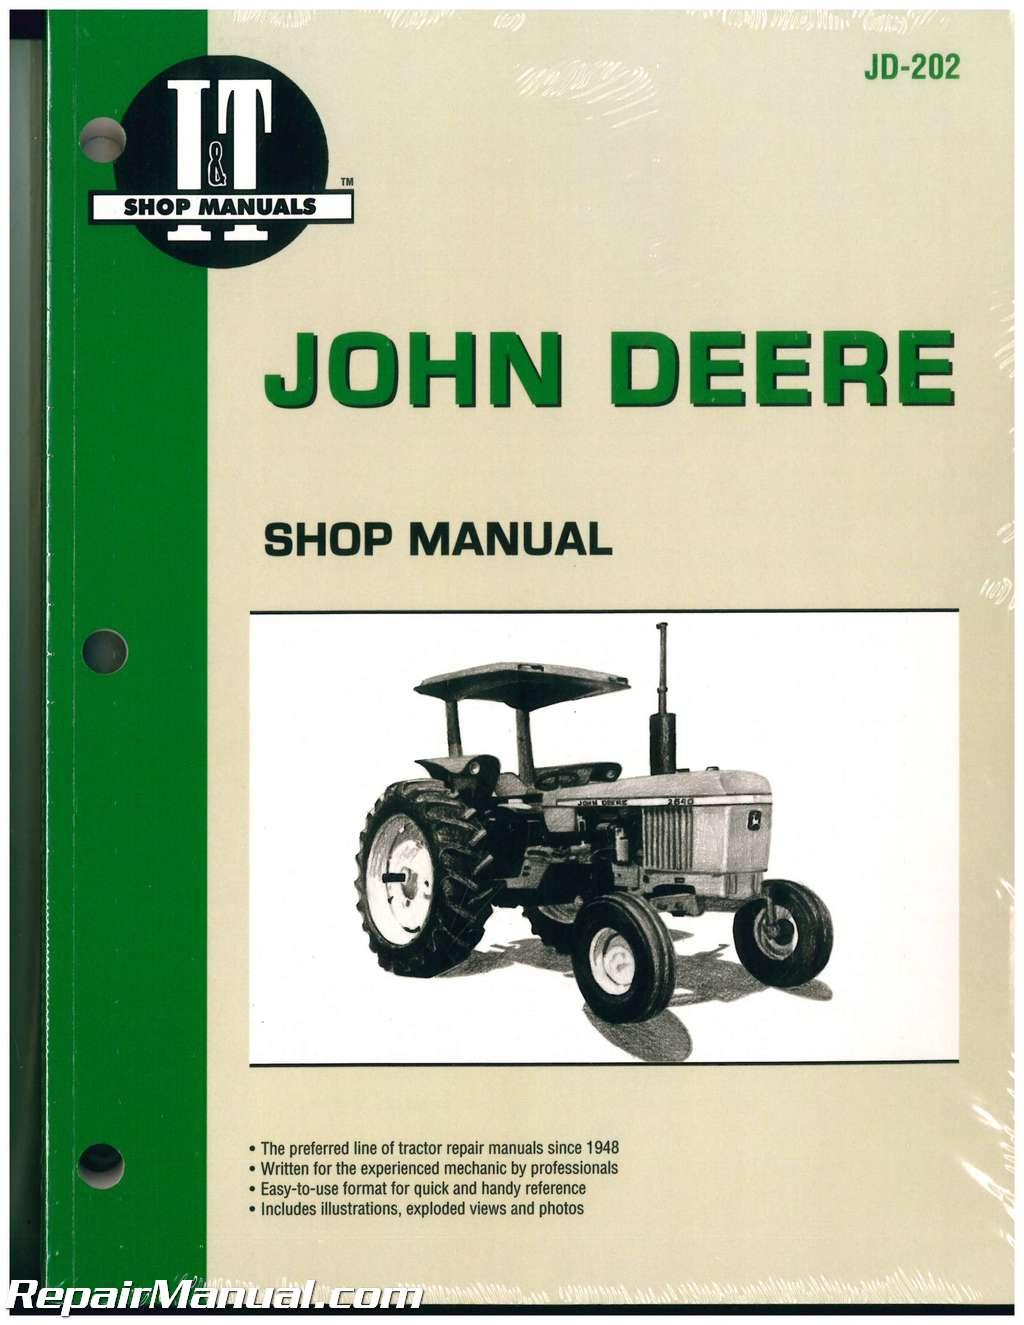 Phenomenal John Deere Tractor Manual 2040 2510 2520 2240 2440 2630 2640 Wiring Cloud Filiciilluminateatxorg